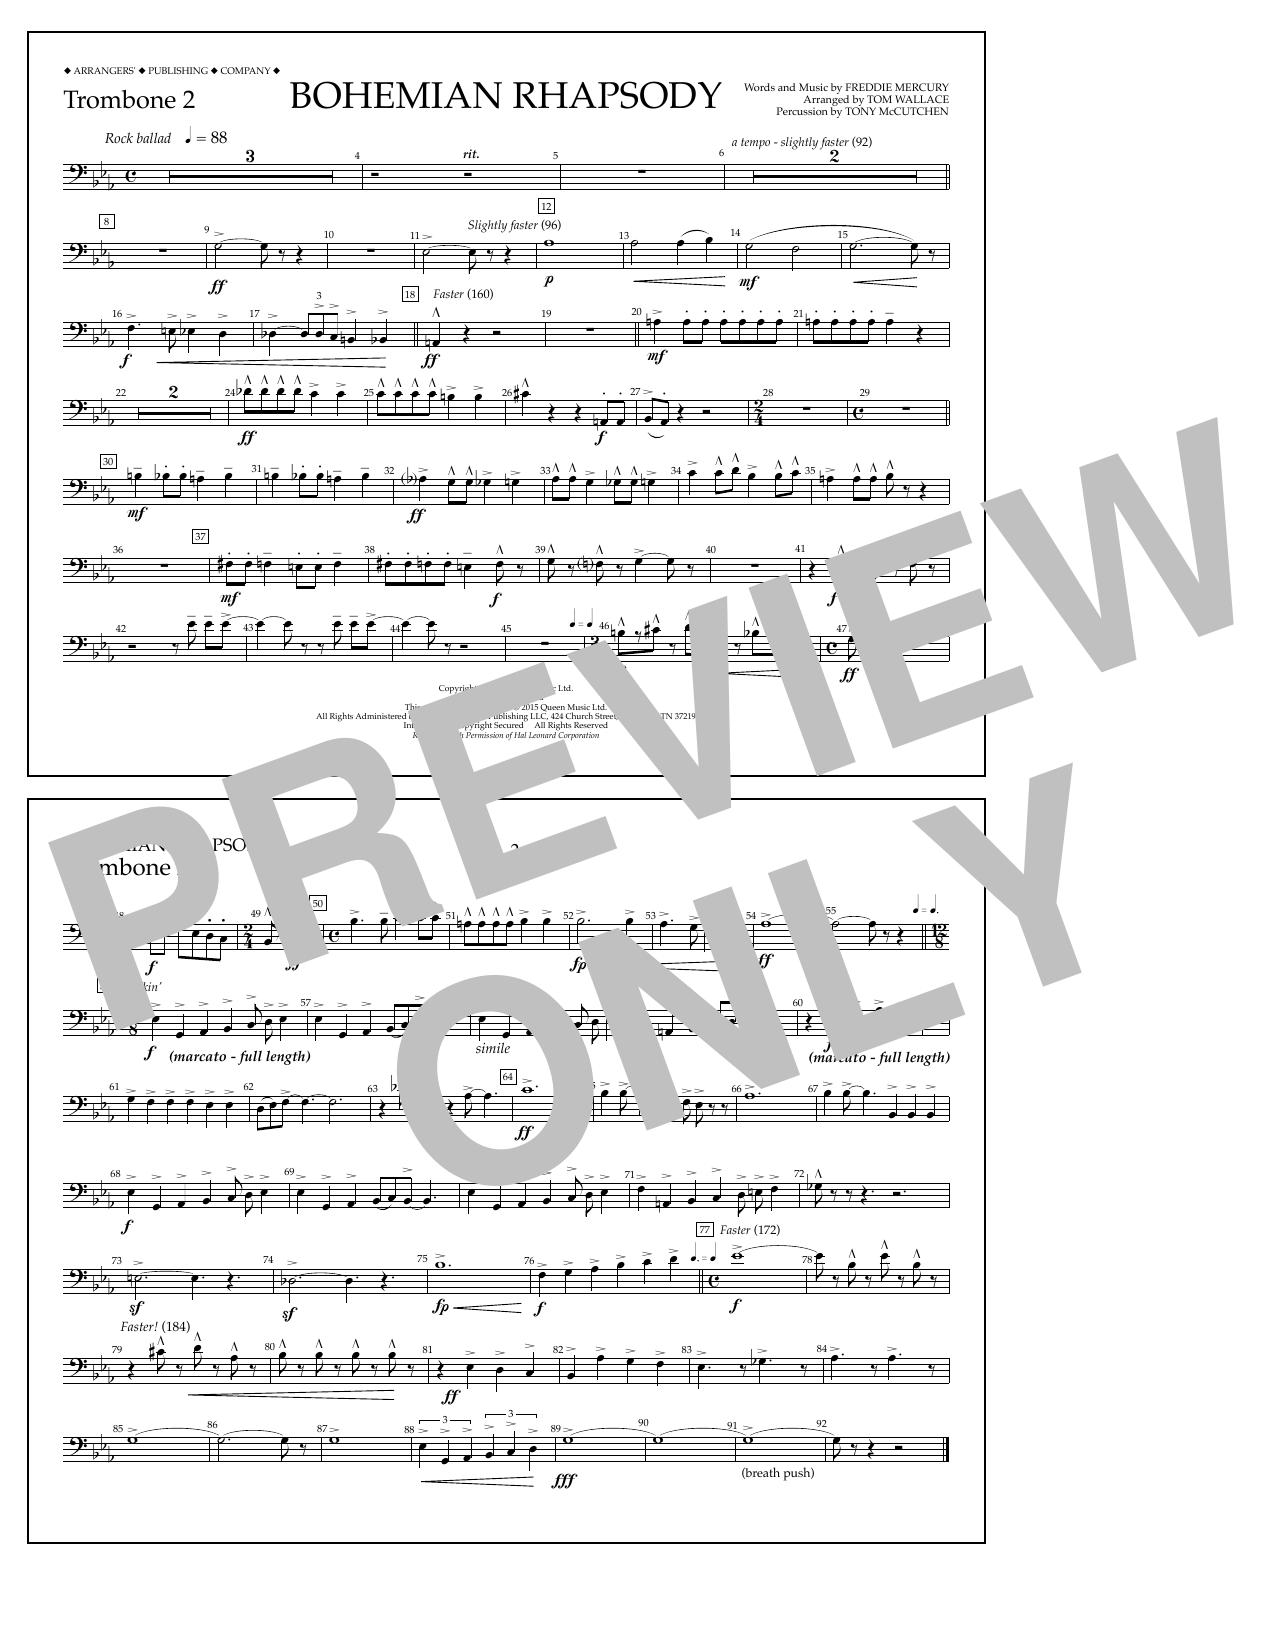 Bohemian Rhapsody - Trombone 2 Sheet Music